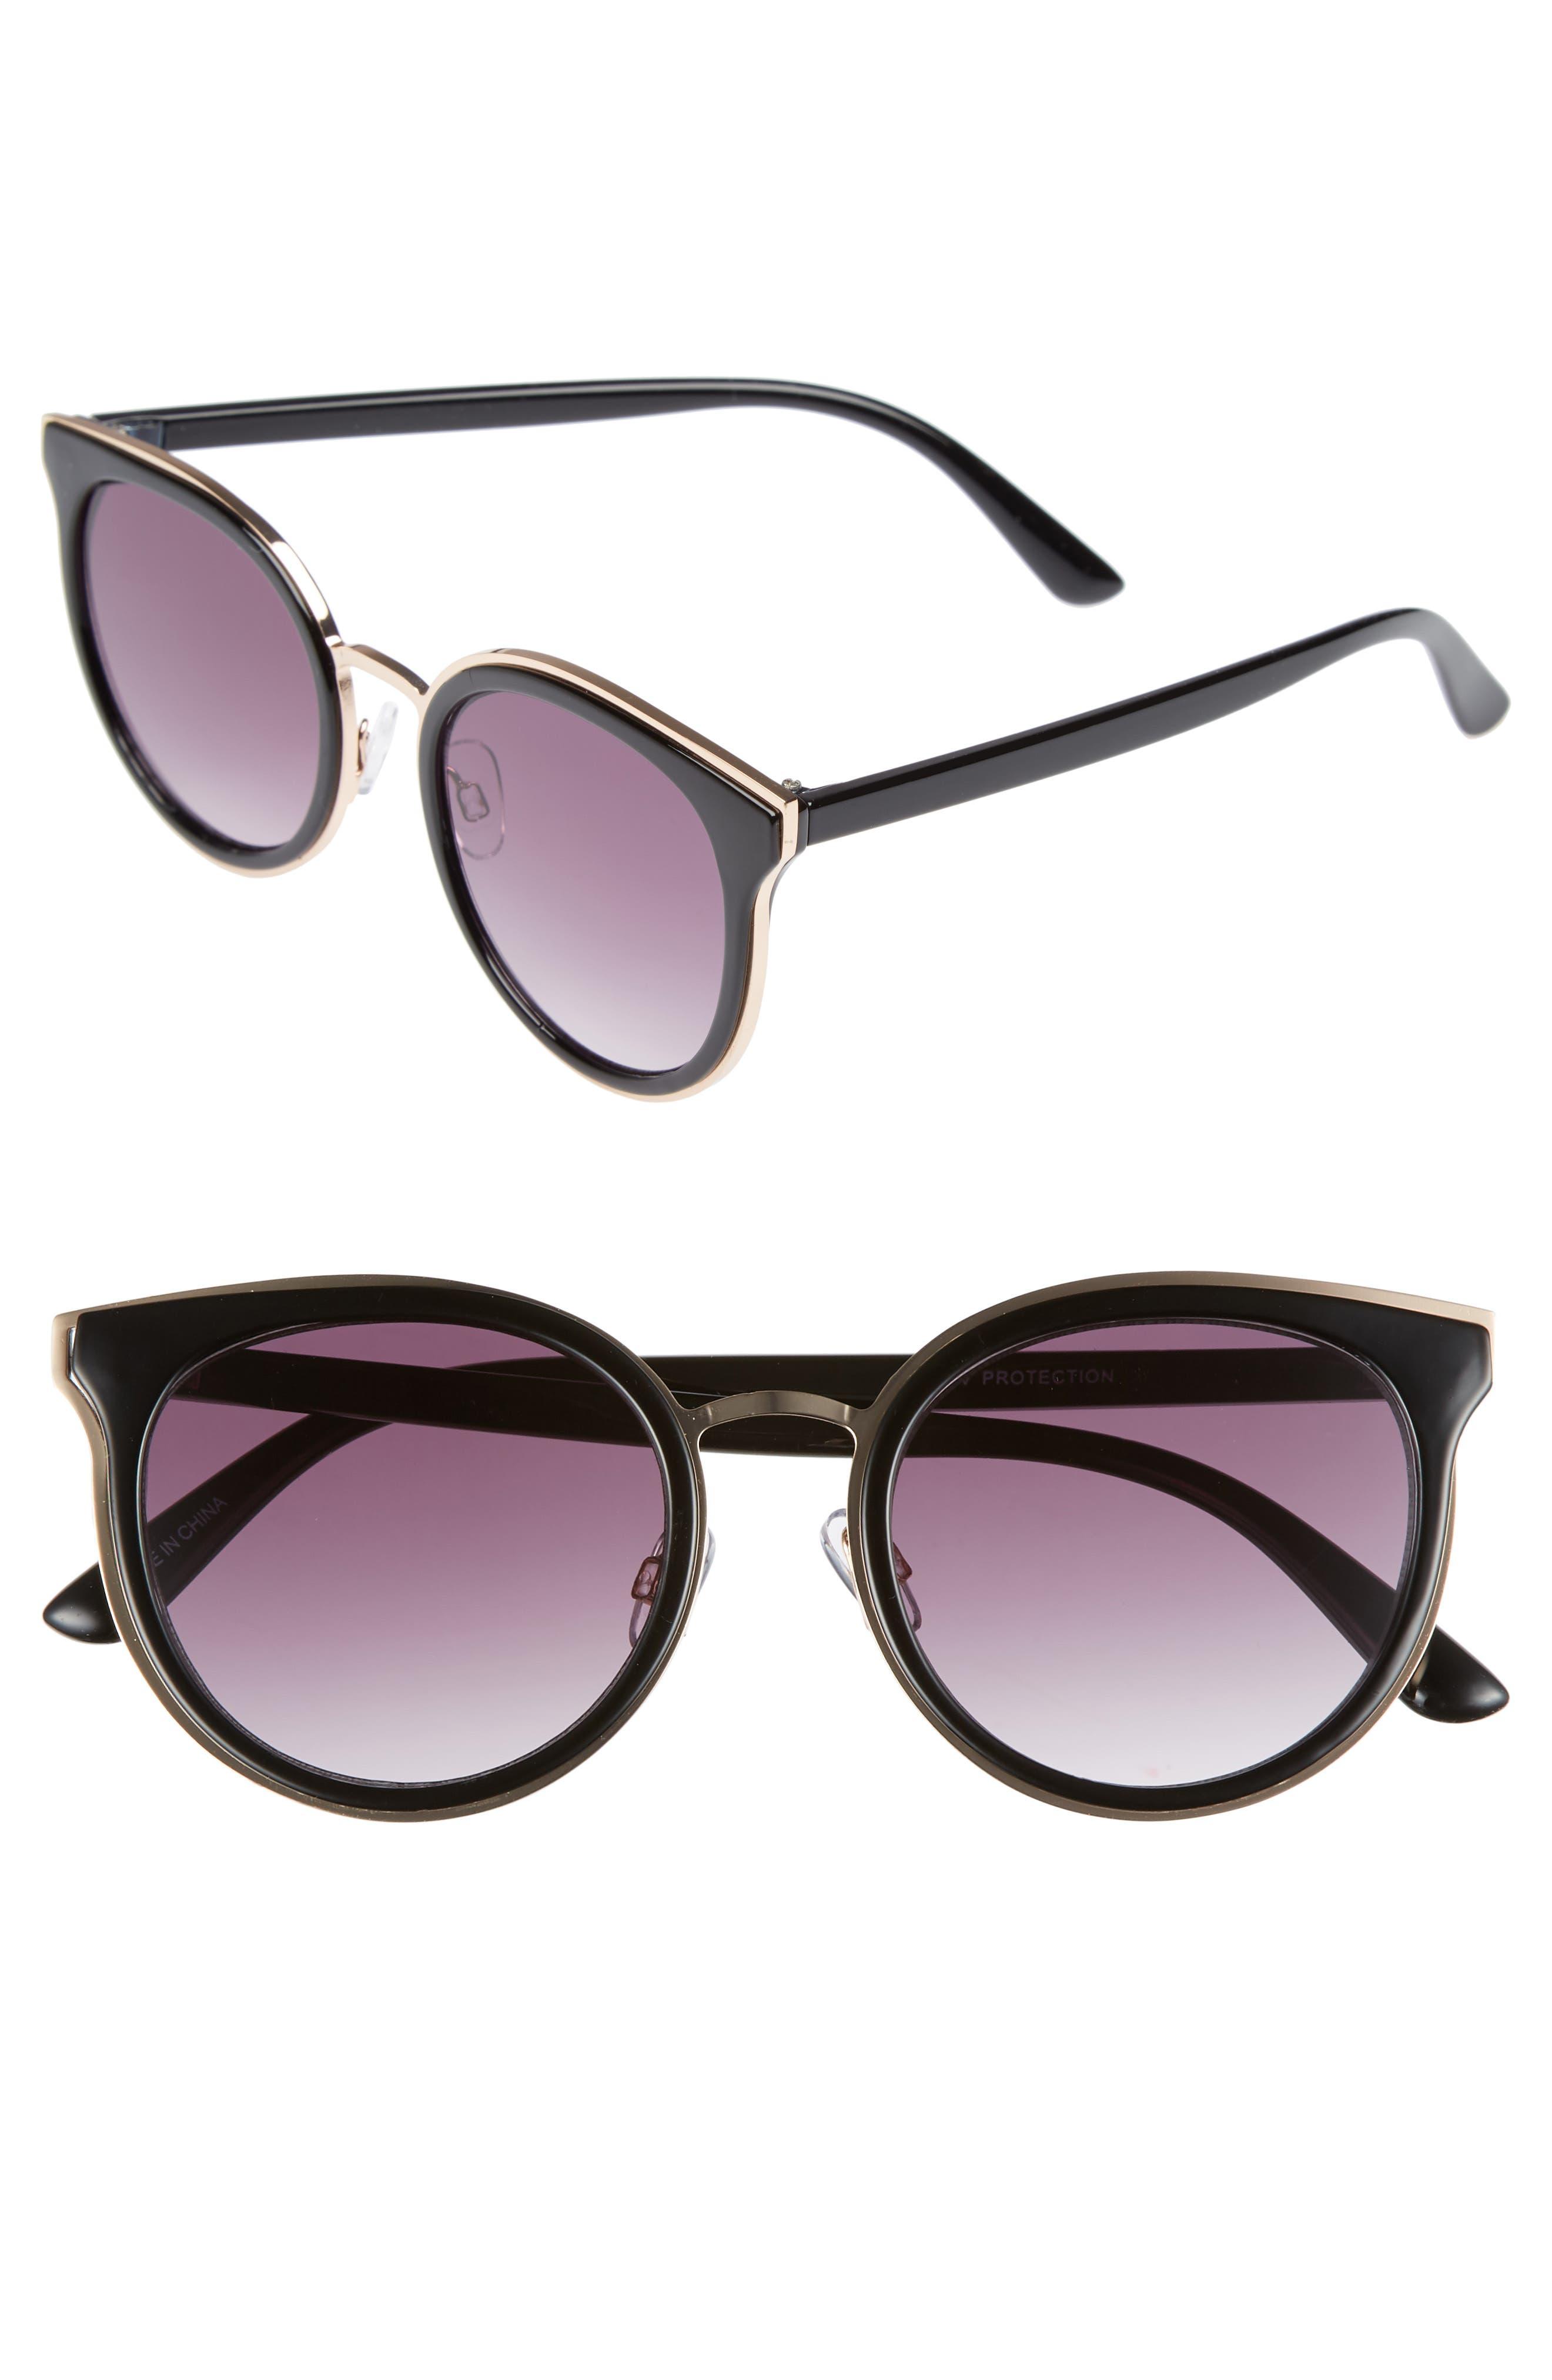 59mm Round Sunglasses,                             Main thumbnail 1, color,                             Gold/ Black